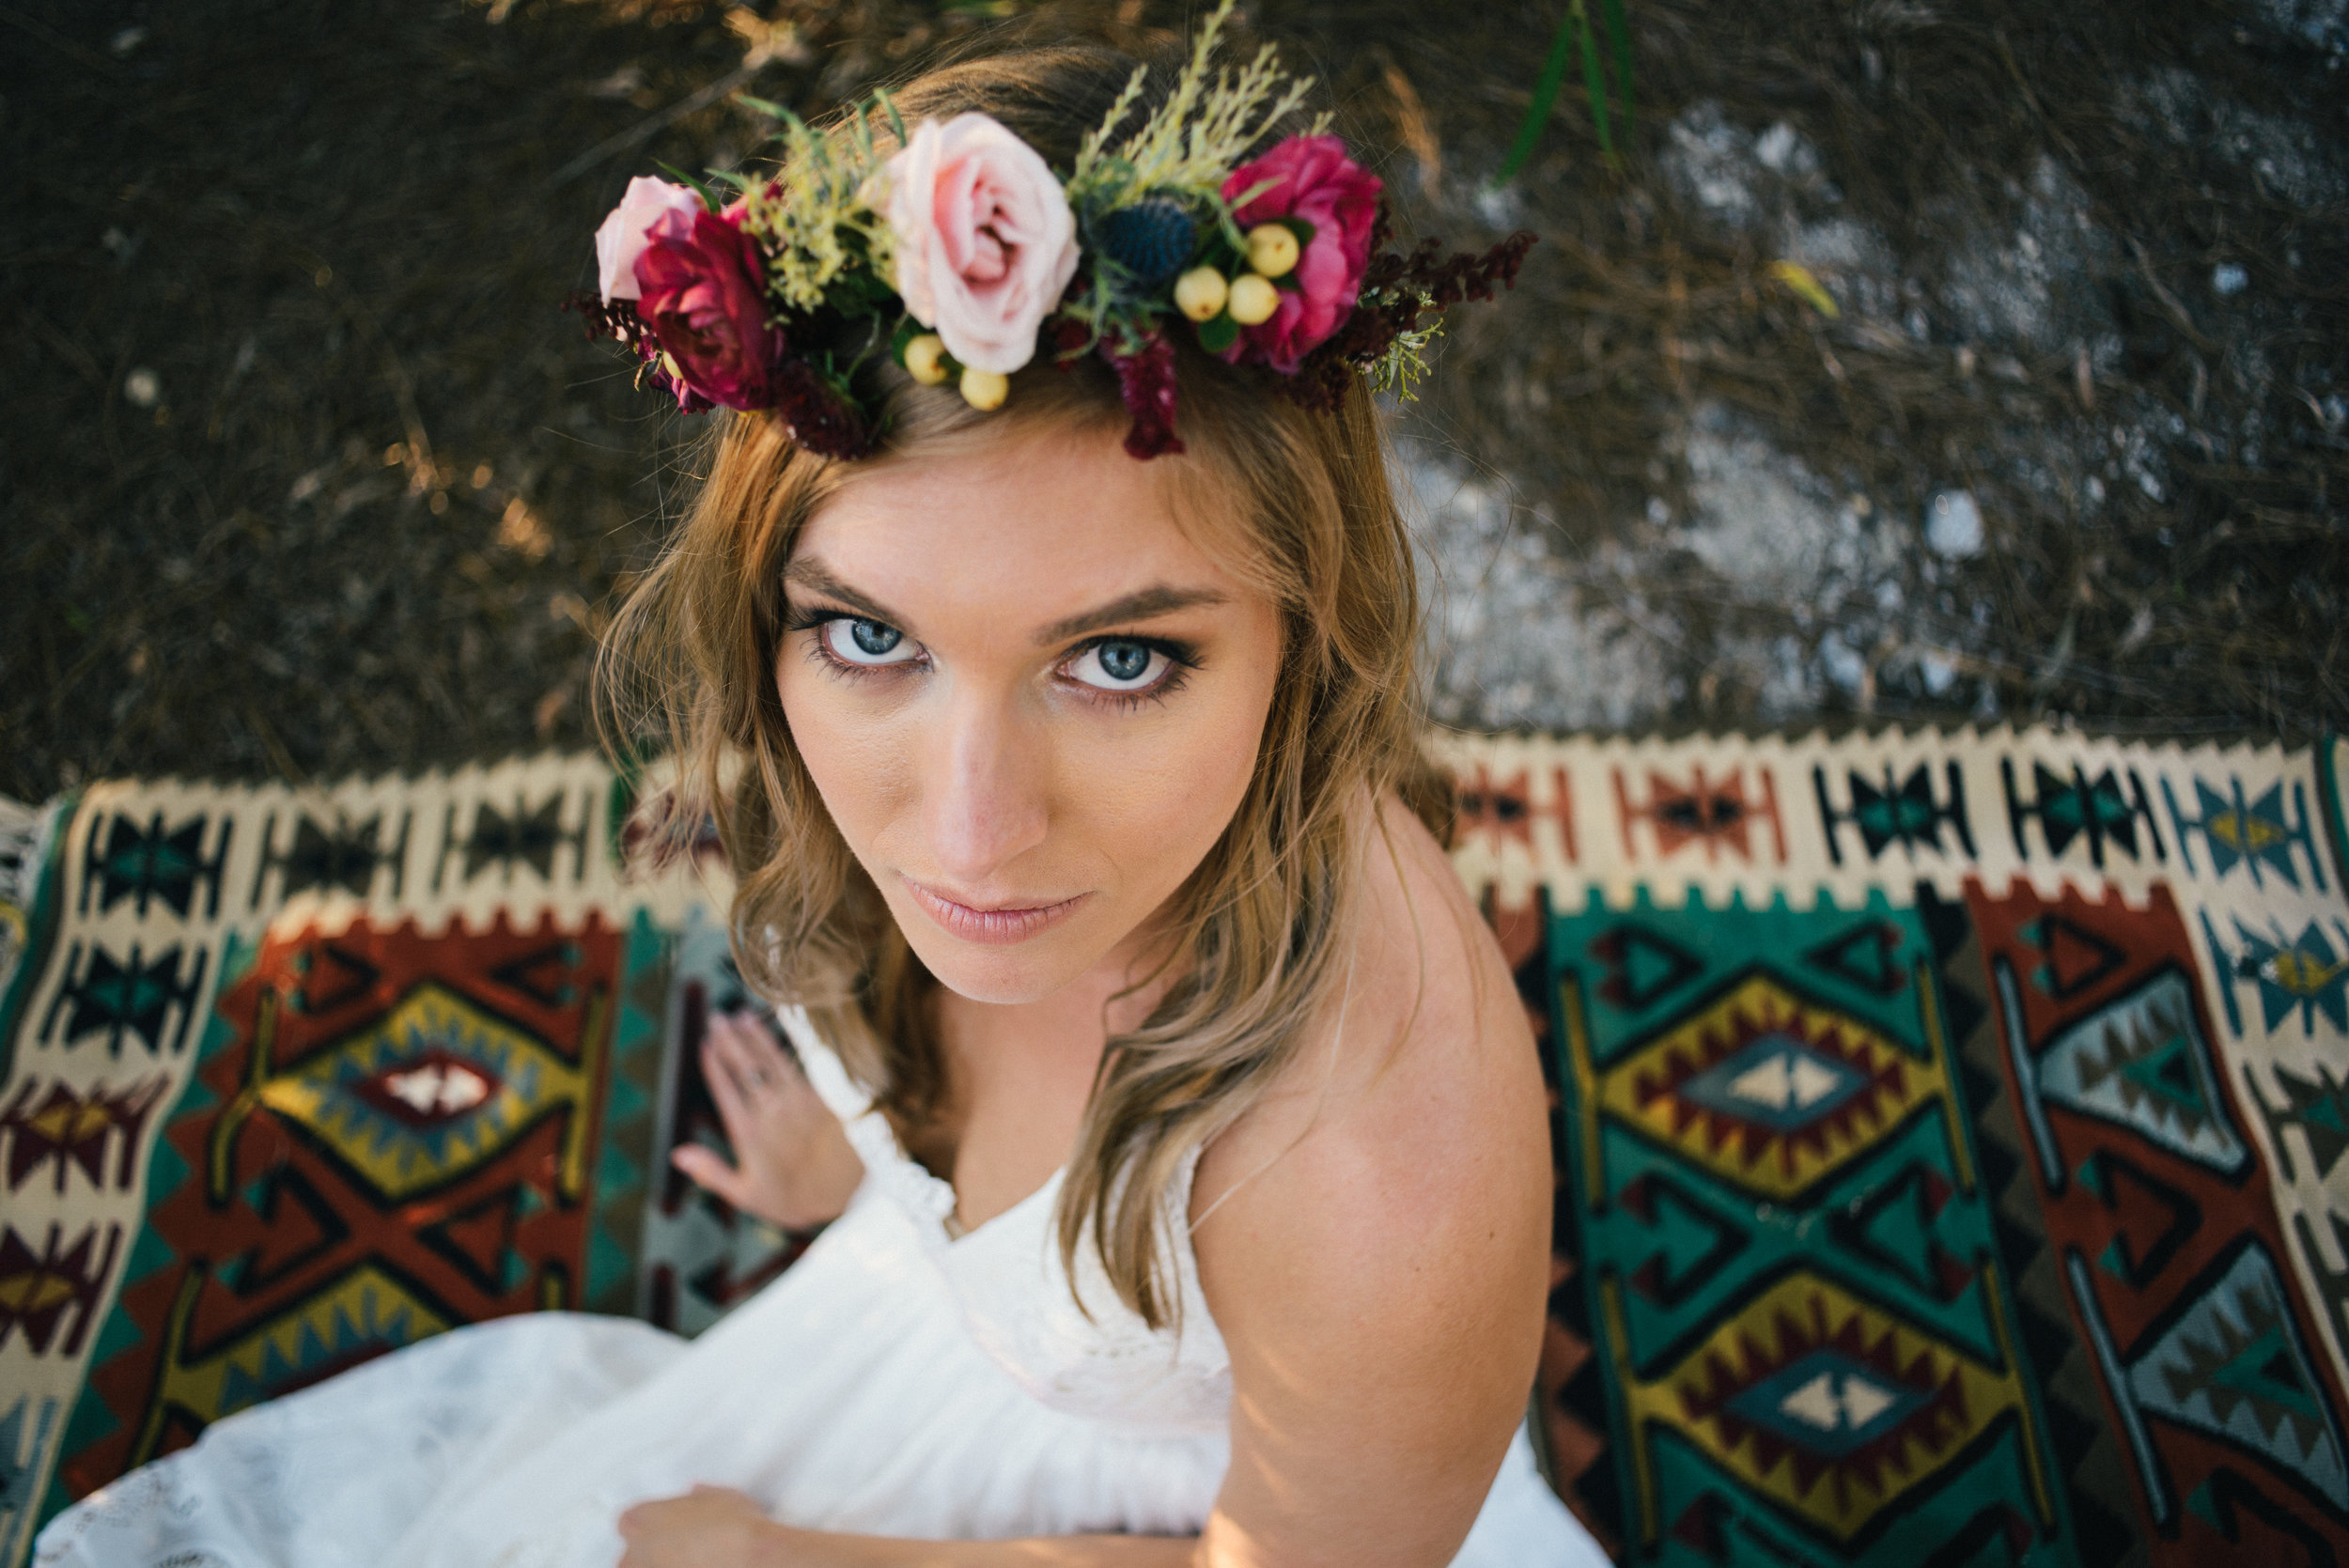 kristin-and-peter-atlanta-georgia-wedding-october-8th-2016 (559 of 1068).jpg